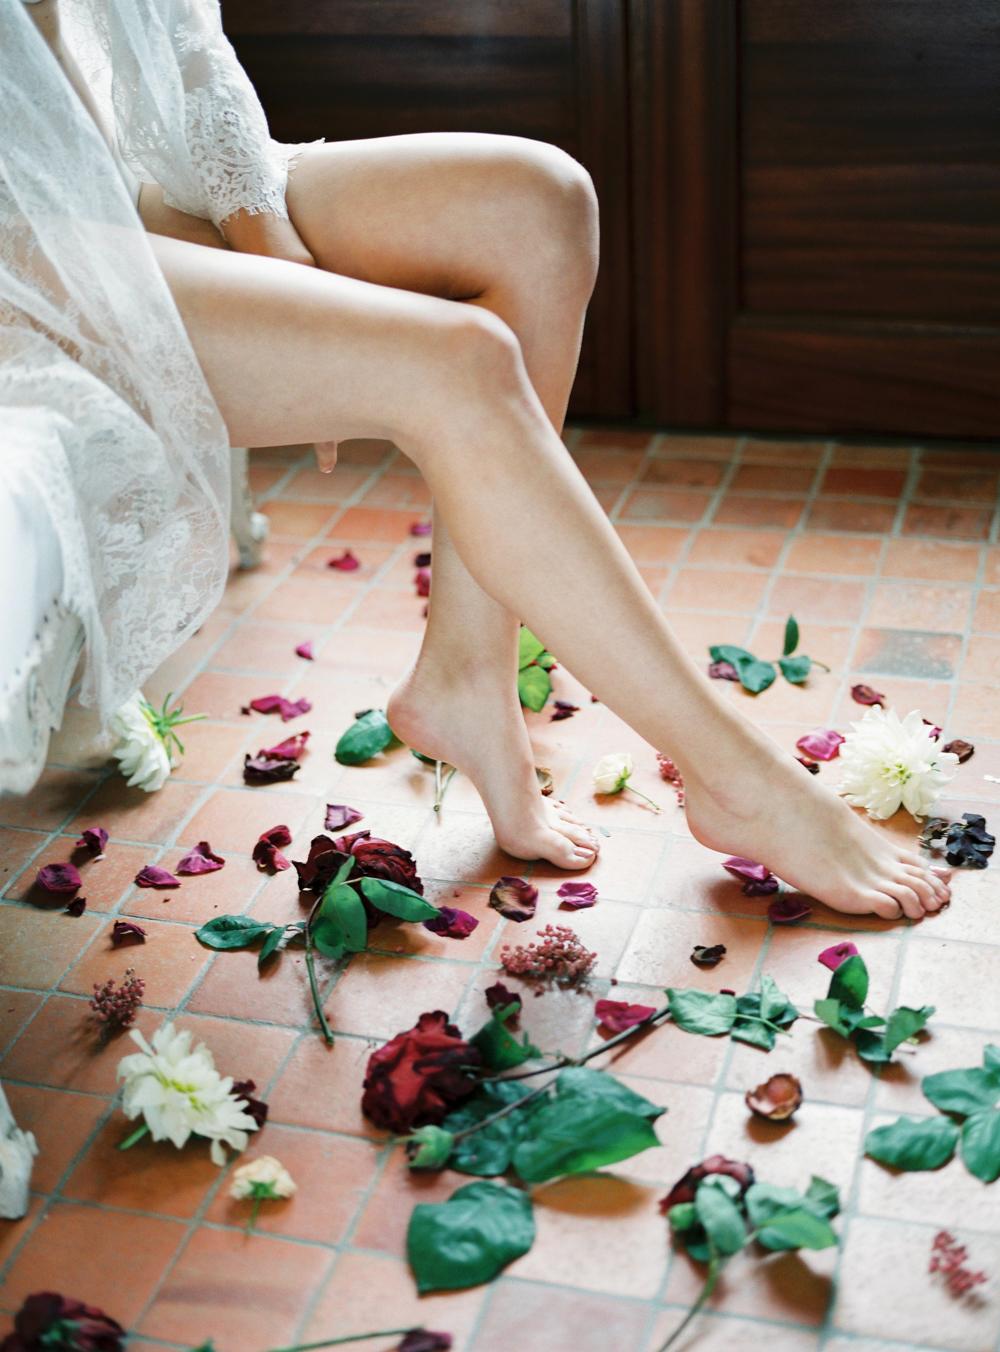 celine_chhuon_photography_Provence_Bride08.jpg